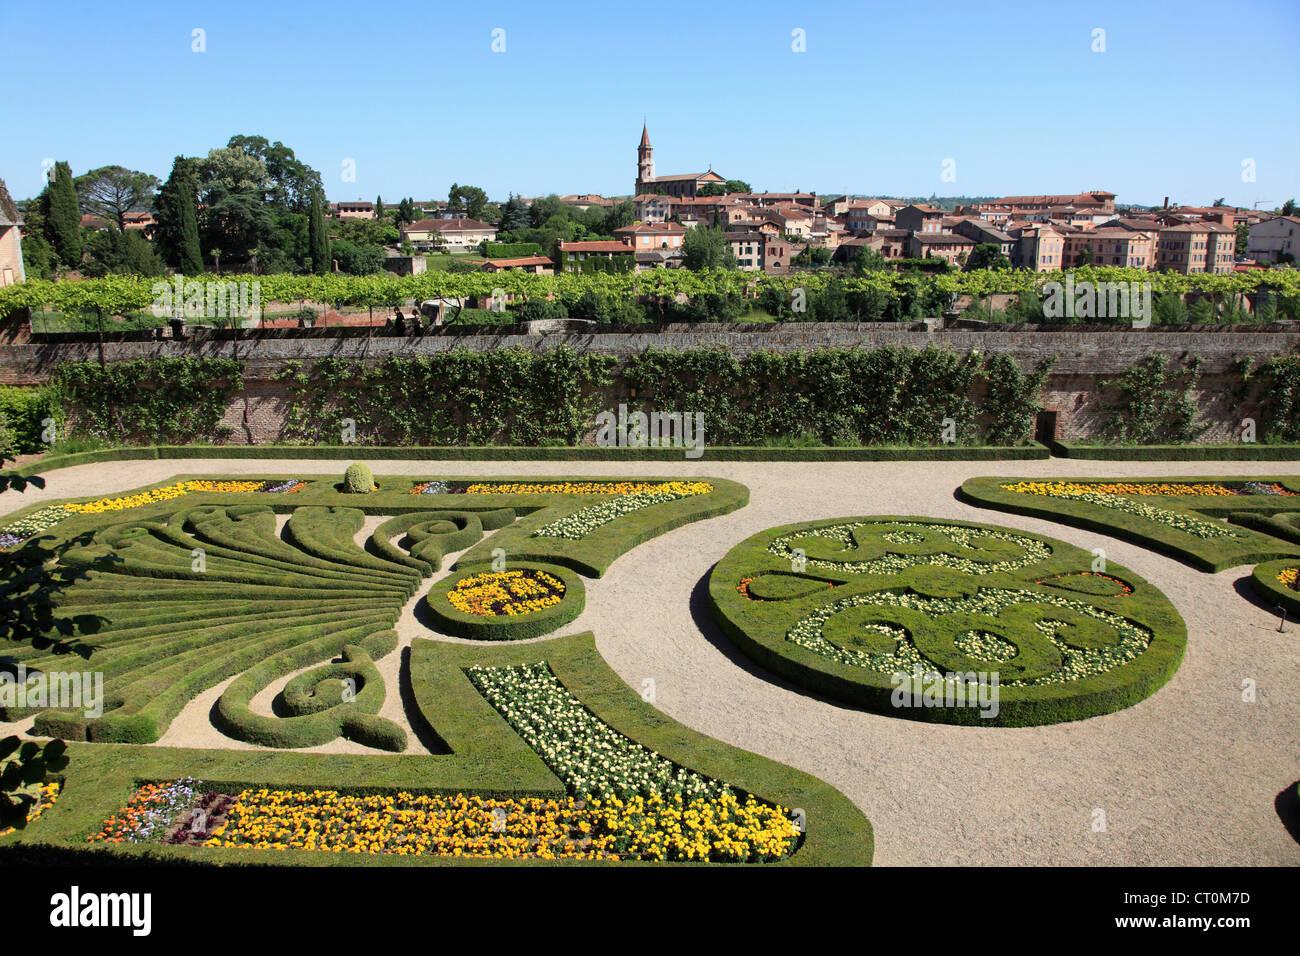 France midi pyr n es albi palais de la berbie jardin for Jardin remarquable